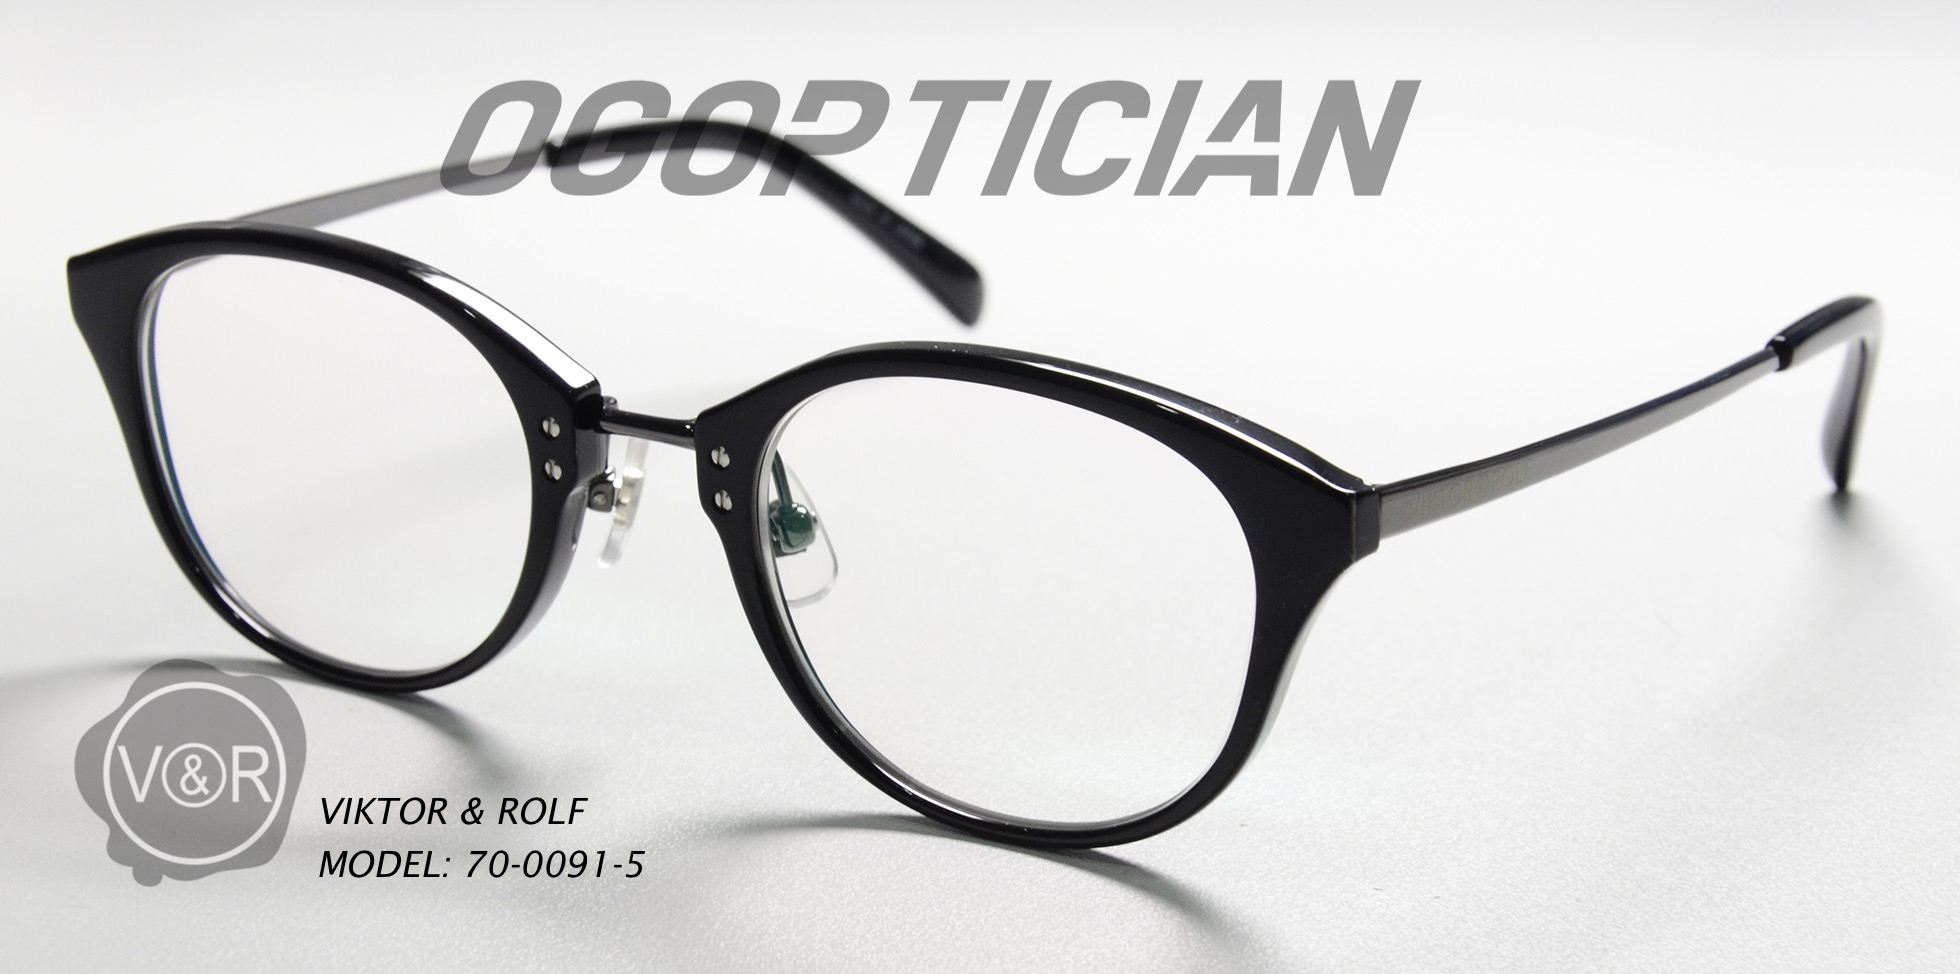 VIKTORANDROLF 70-0091-5